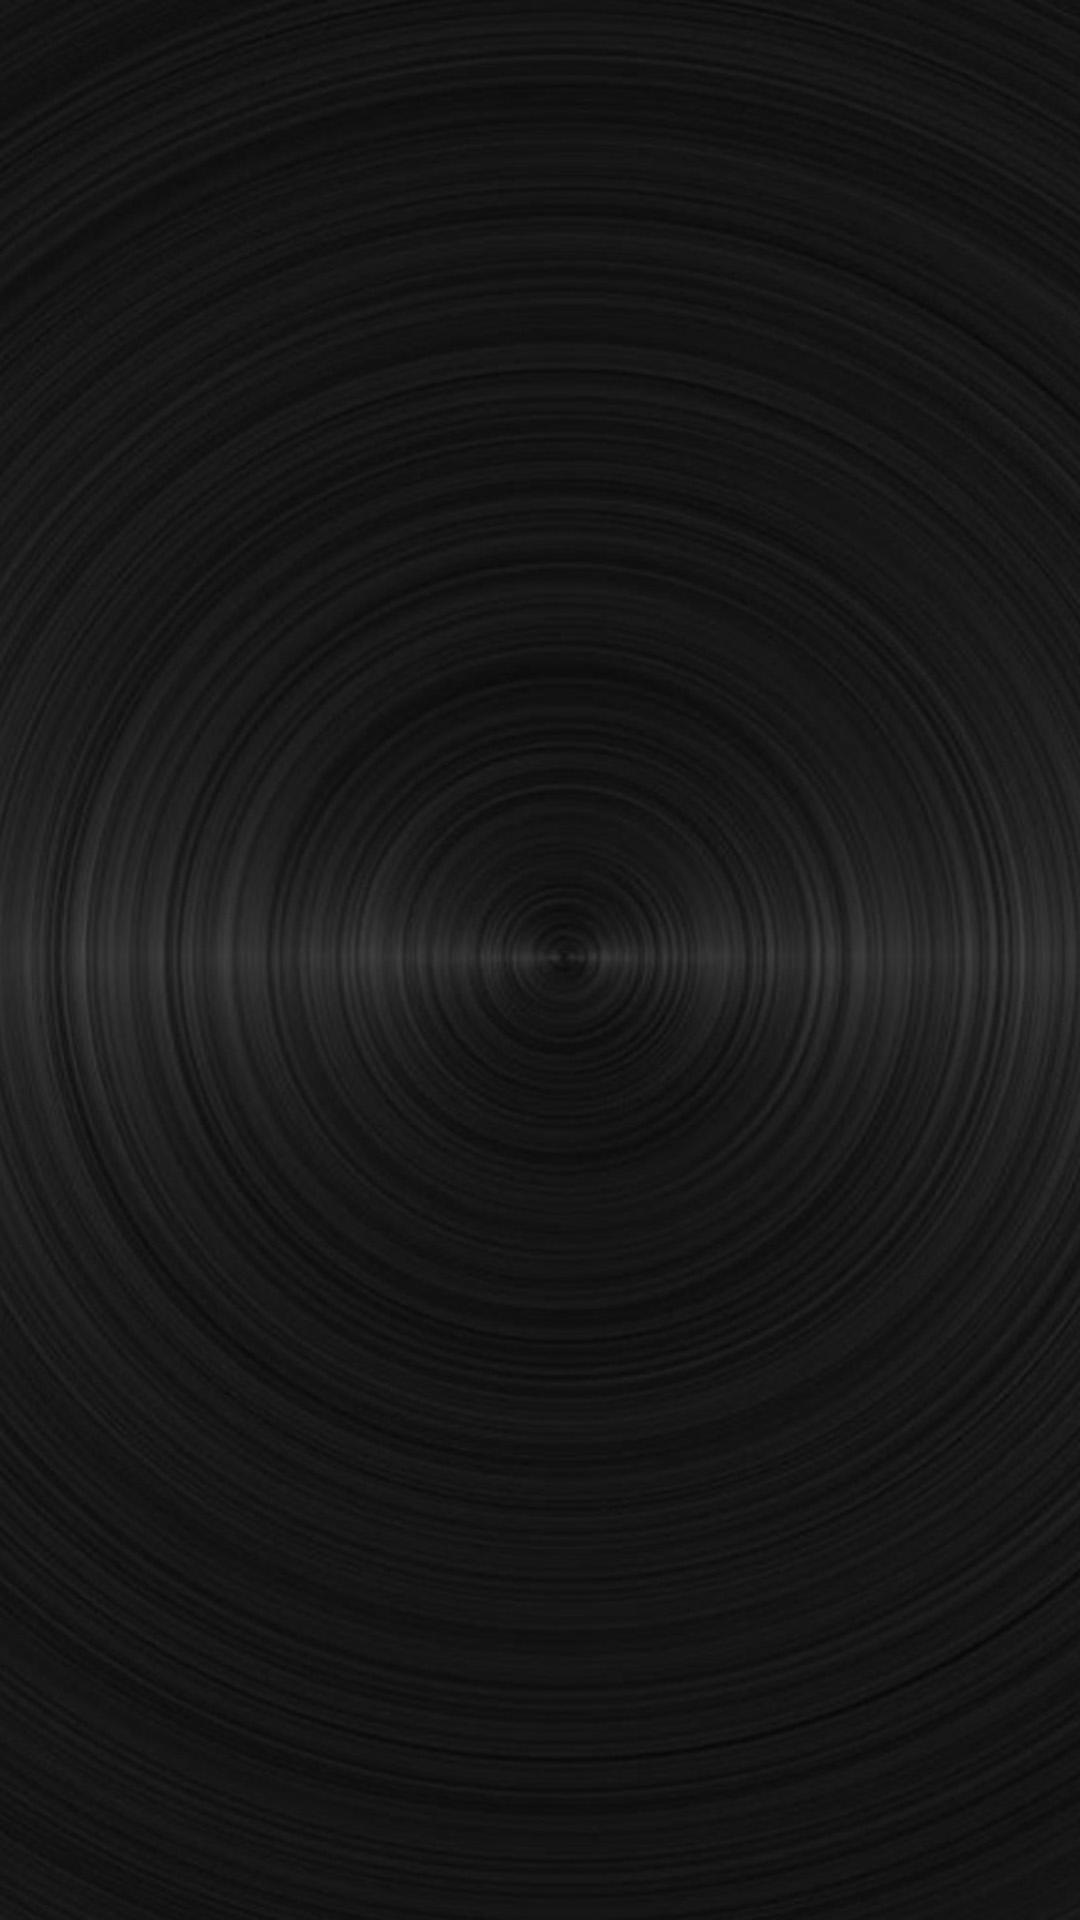 Solid Black Wallpaper | iPhone Wallpaper